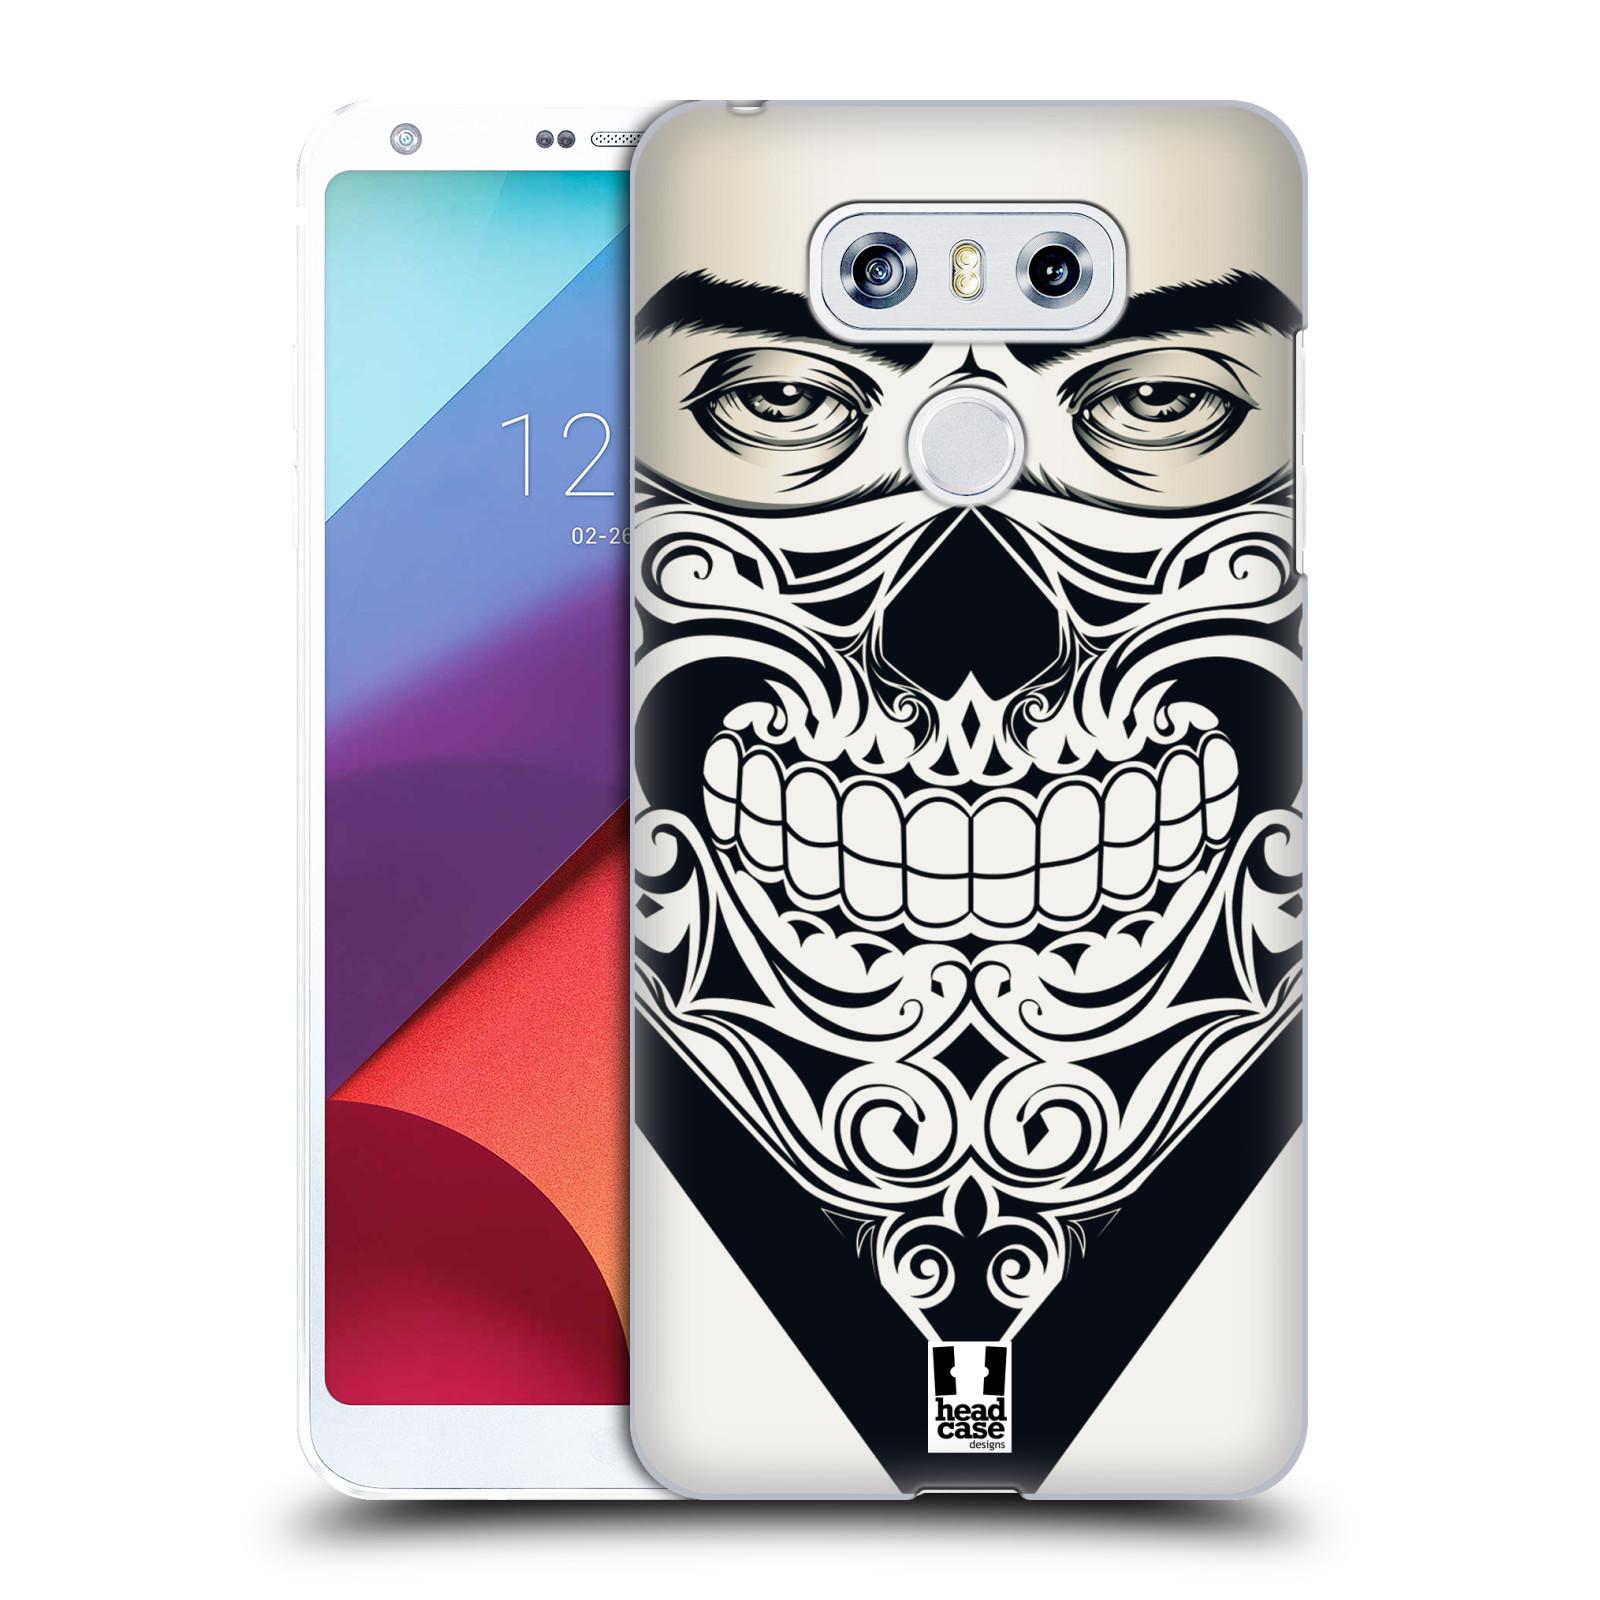 Plastové pouzdro na mobil LG G6 - Head Case LEBKA BANDANA